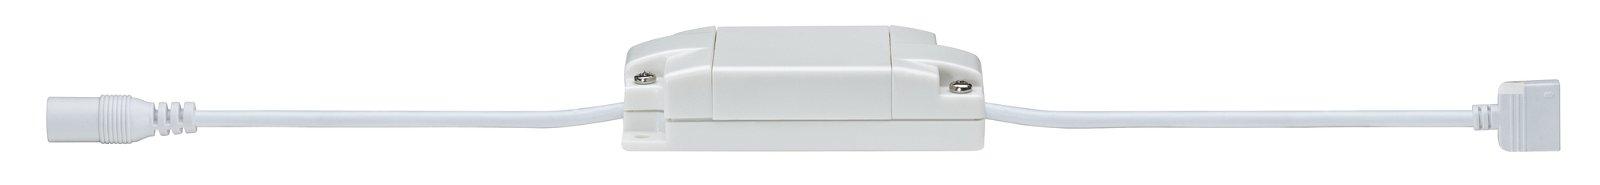 MaxLED 500 Controller Smart Home Bluetooth RGBW DC 24V max. 144W Weiß